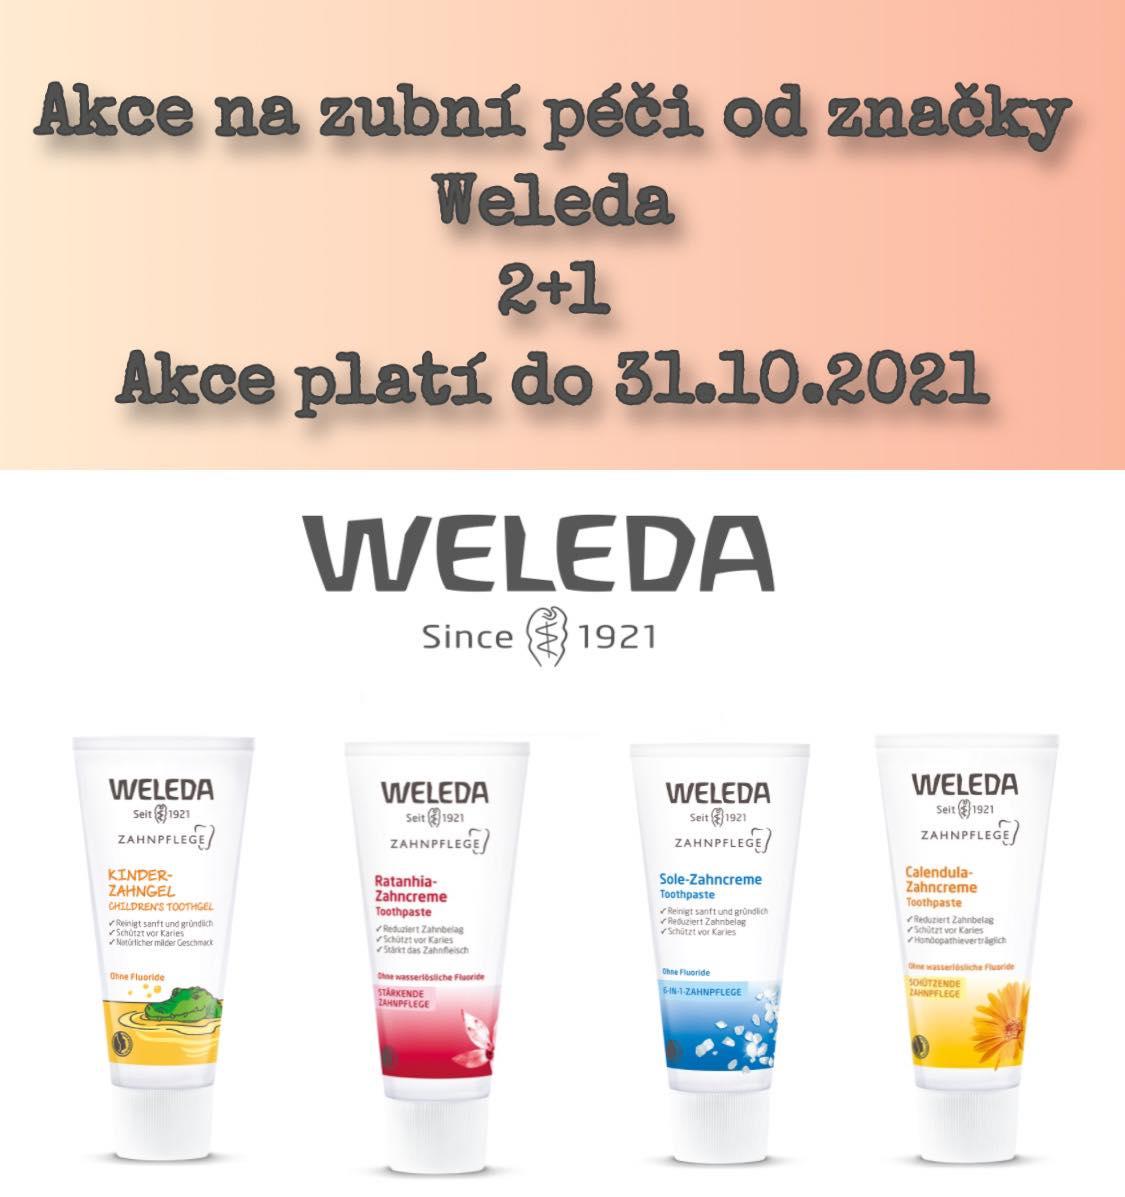 Weleda 2+1